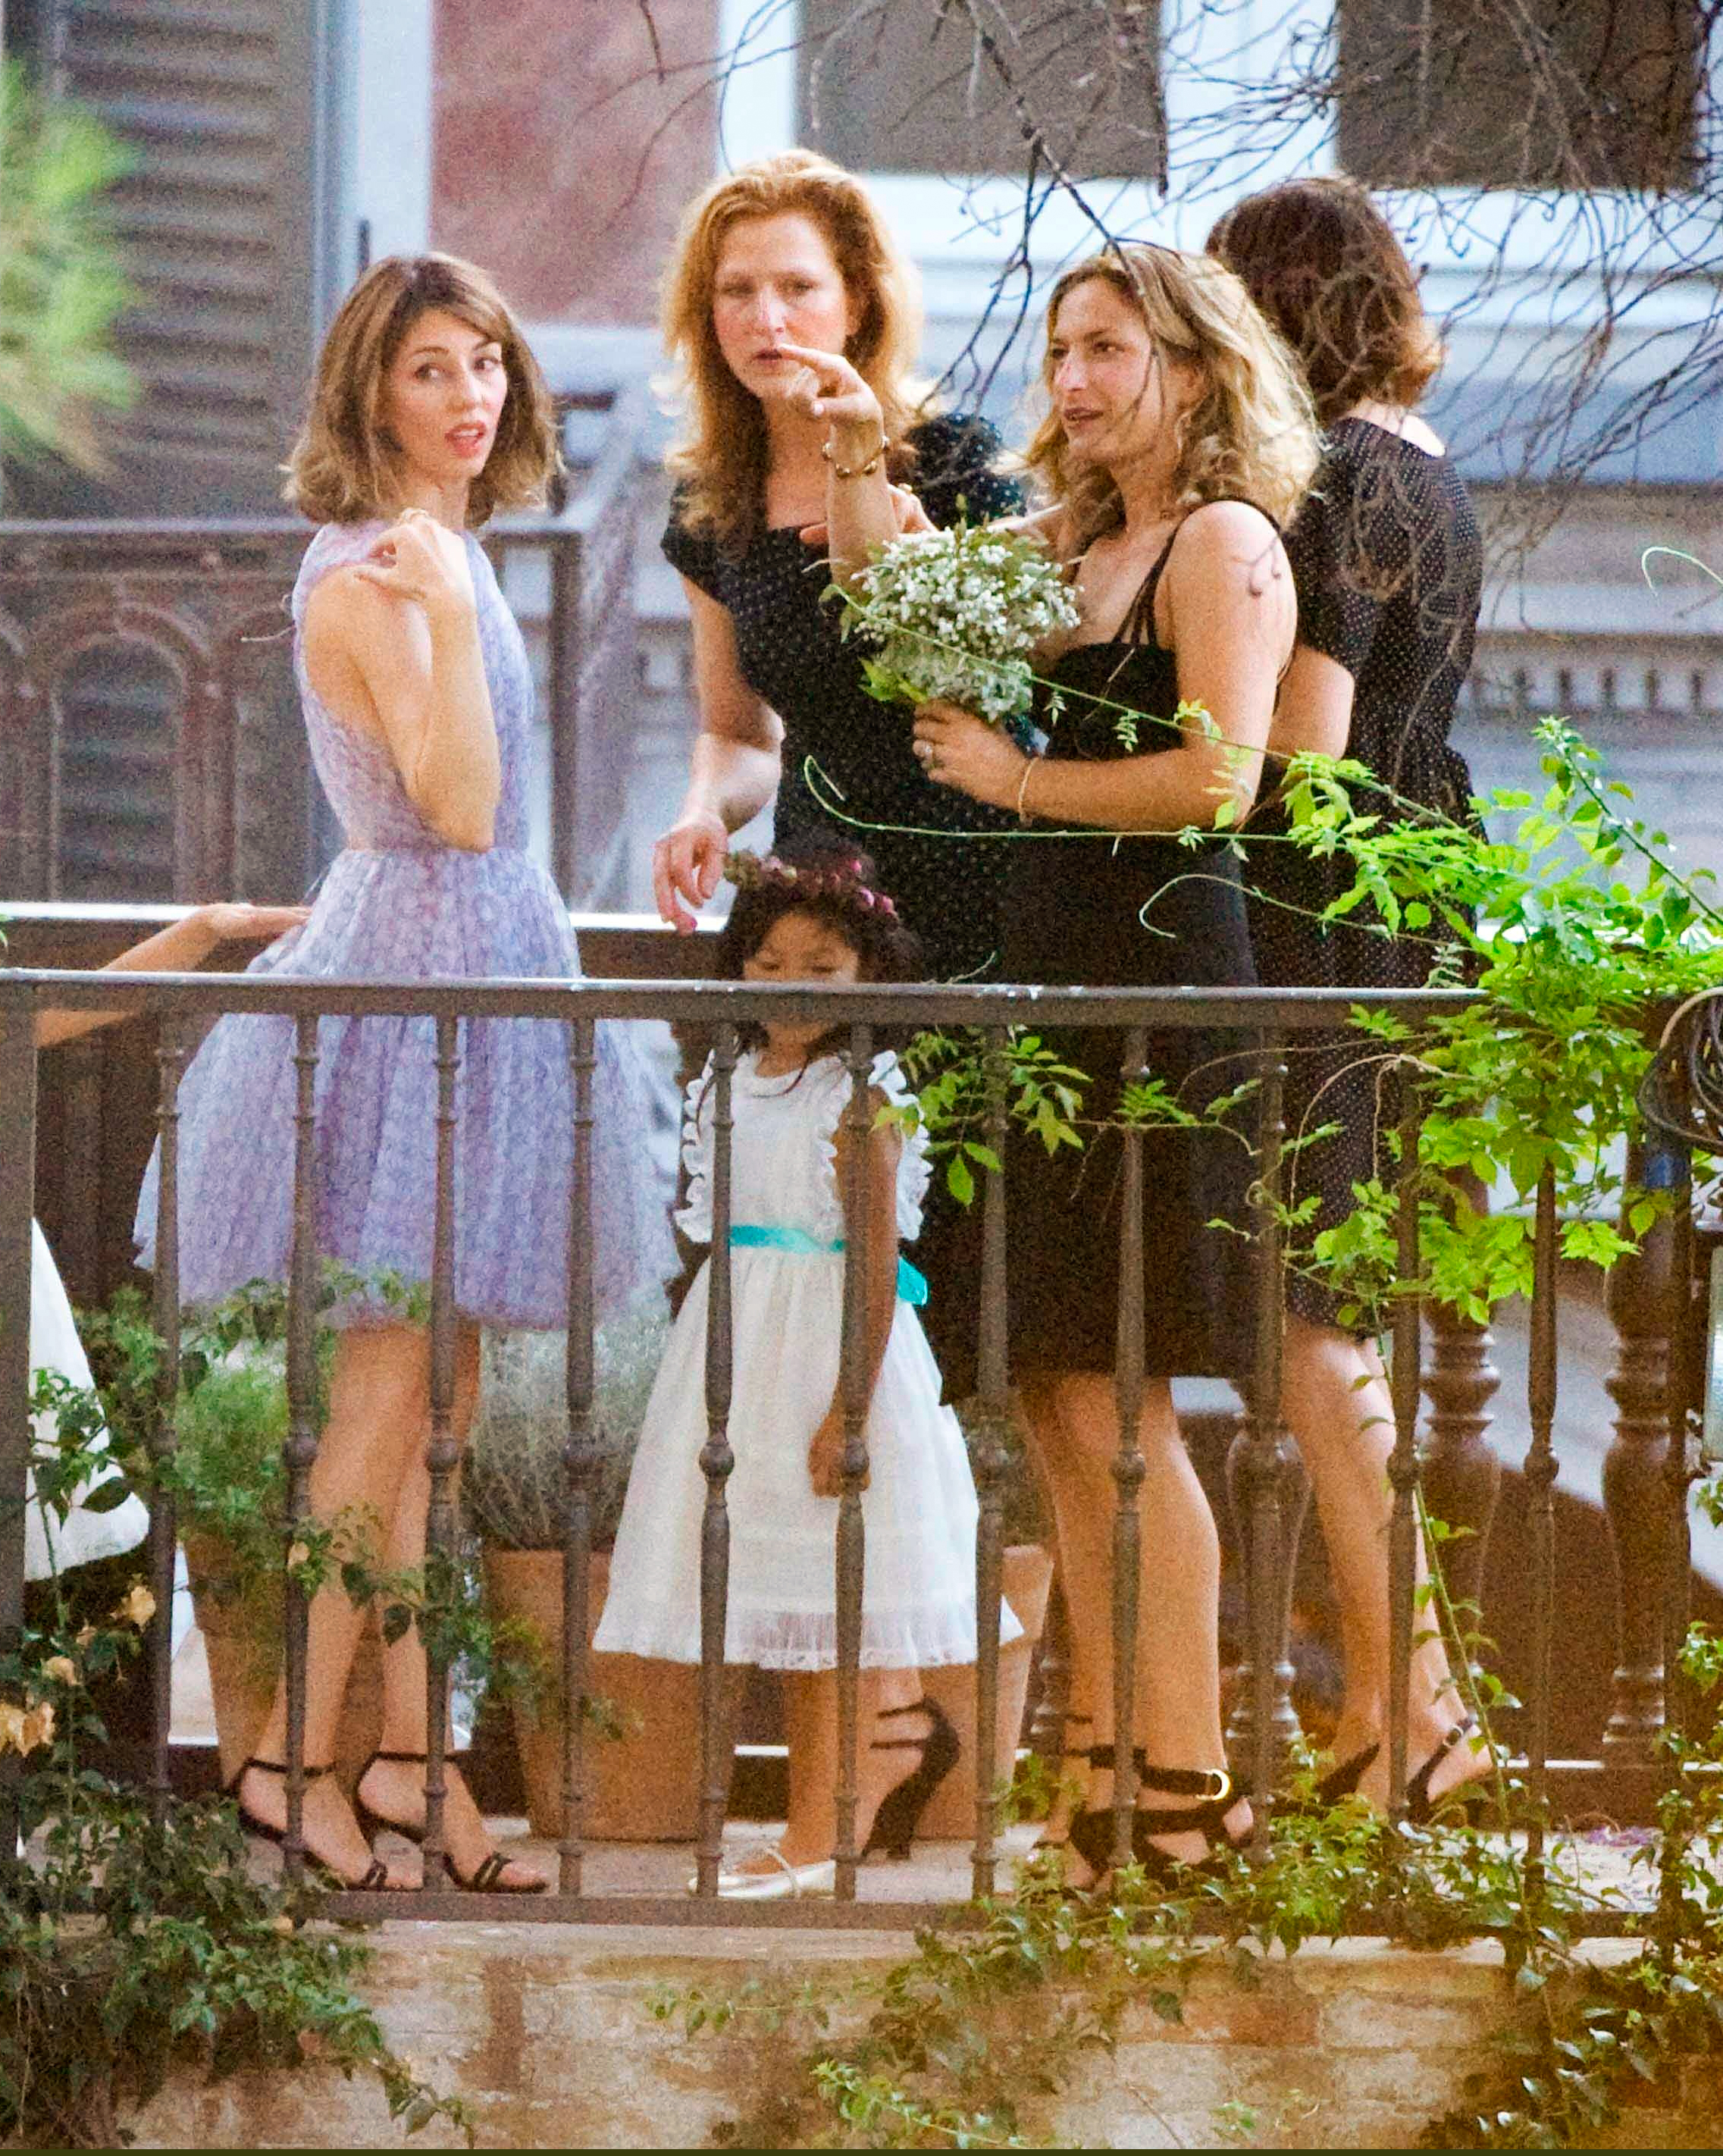 celebrity-colorful-wedding-dresses-sofia-coppola-0815.jpg